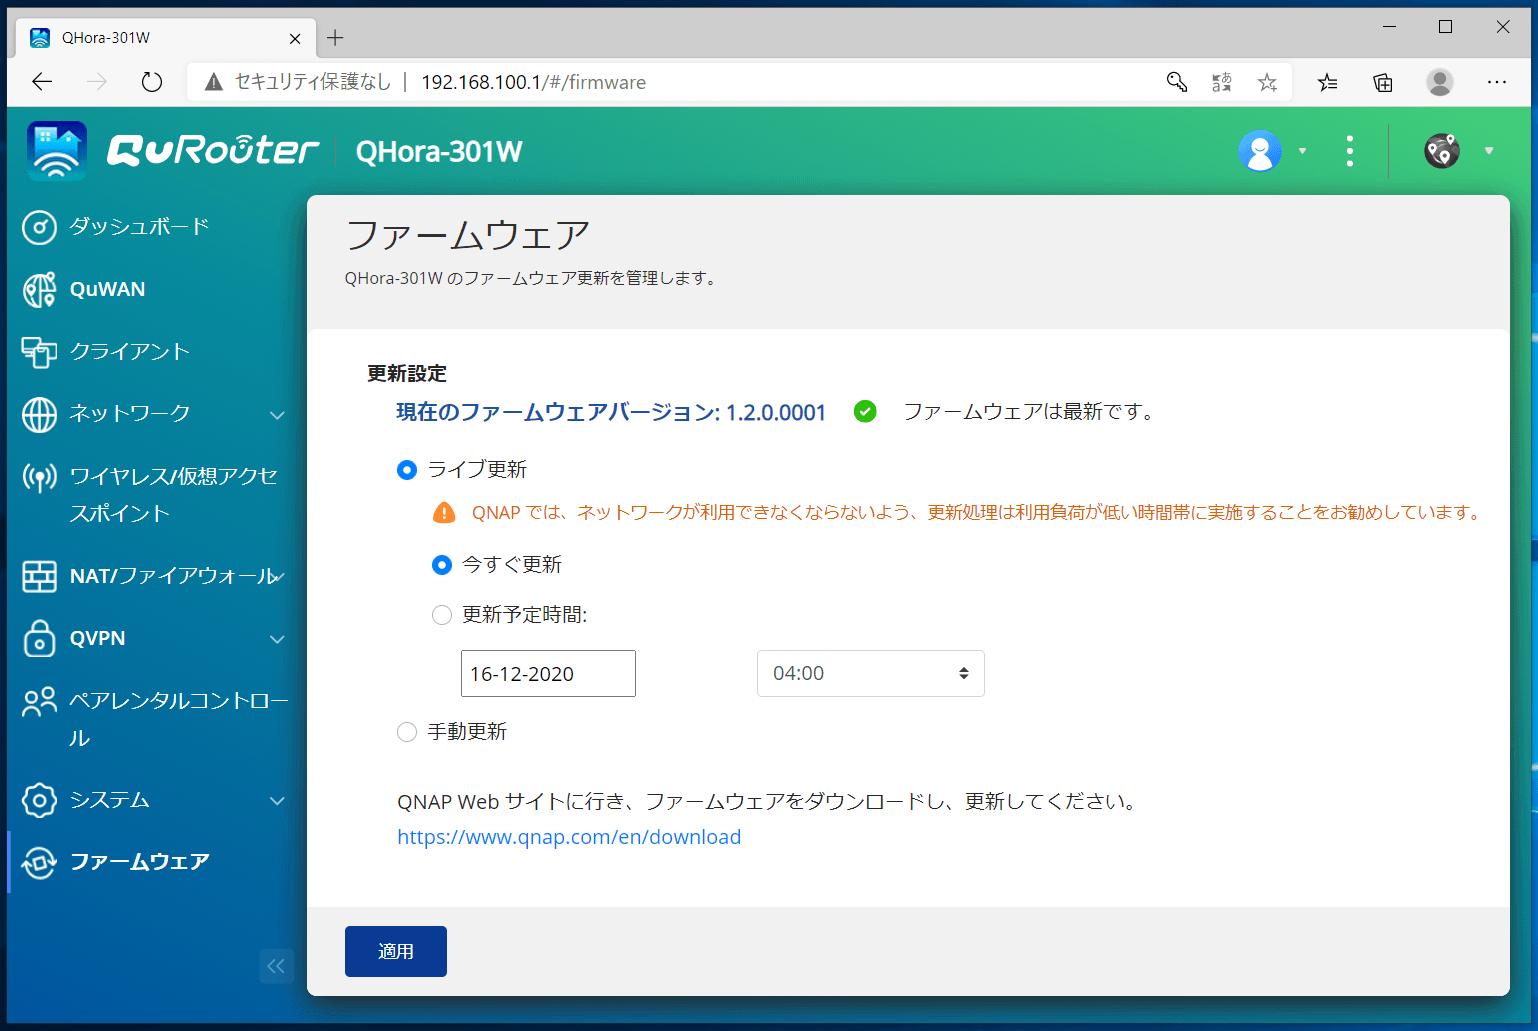 QNAP QHora-301W_setting_6-1_firmware